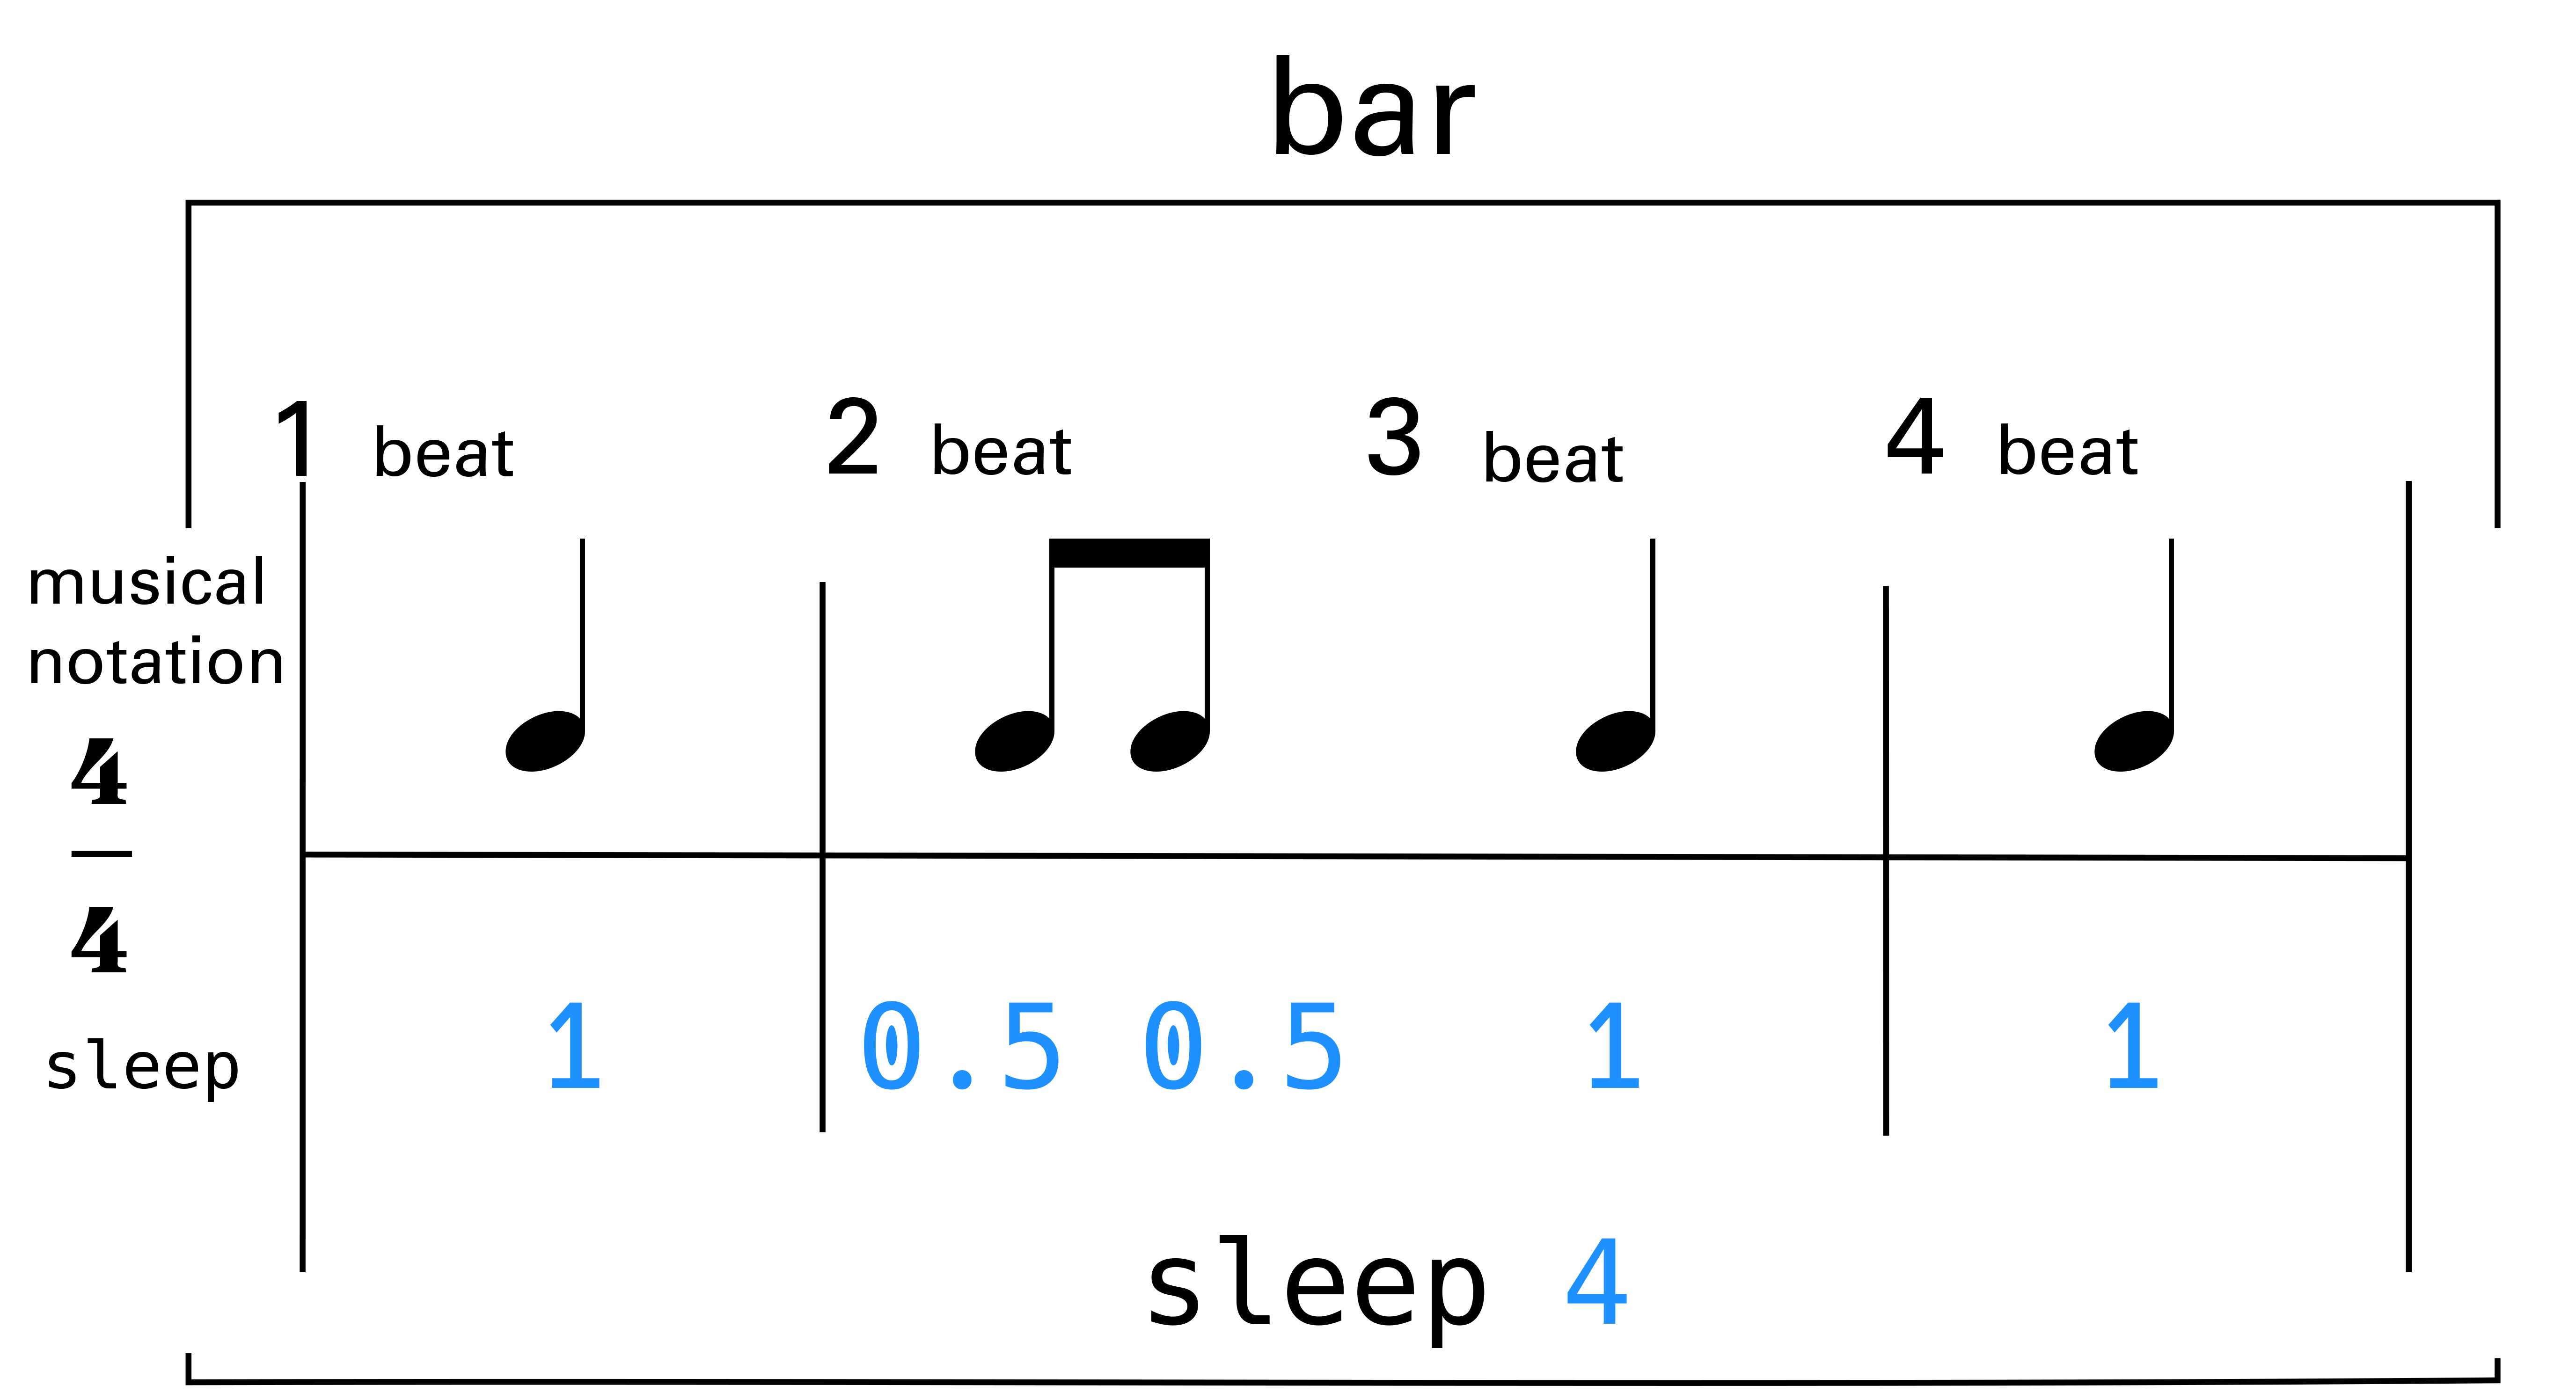 bar visualisation